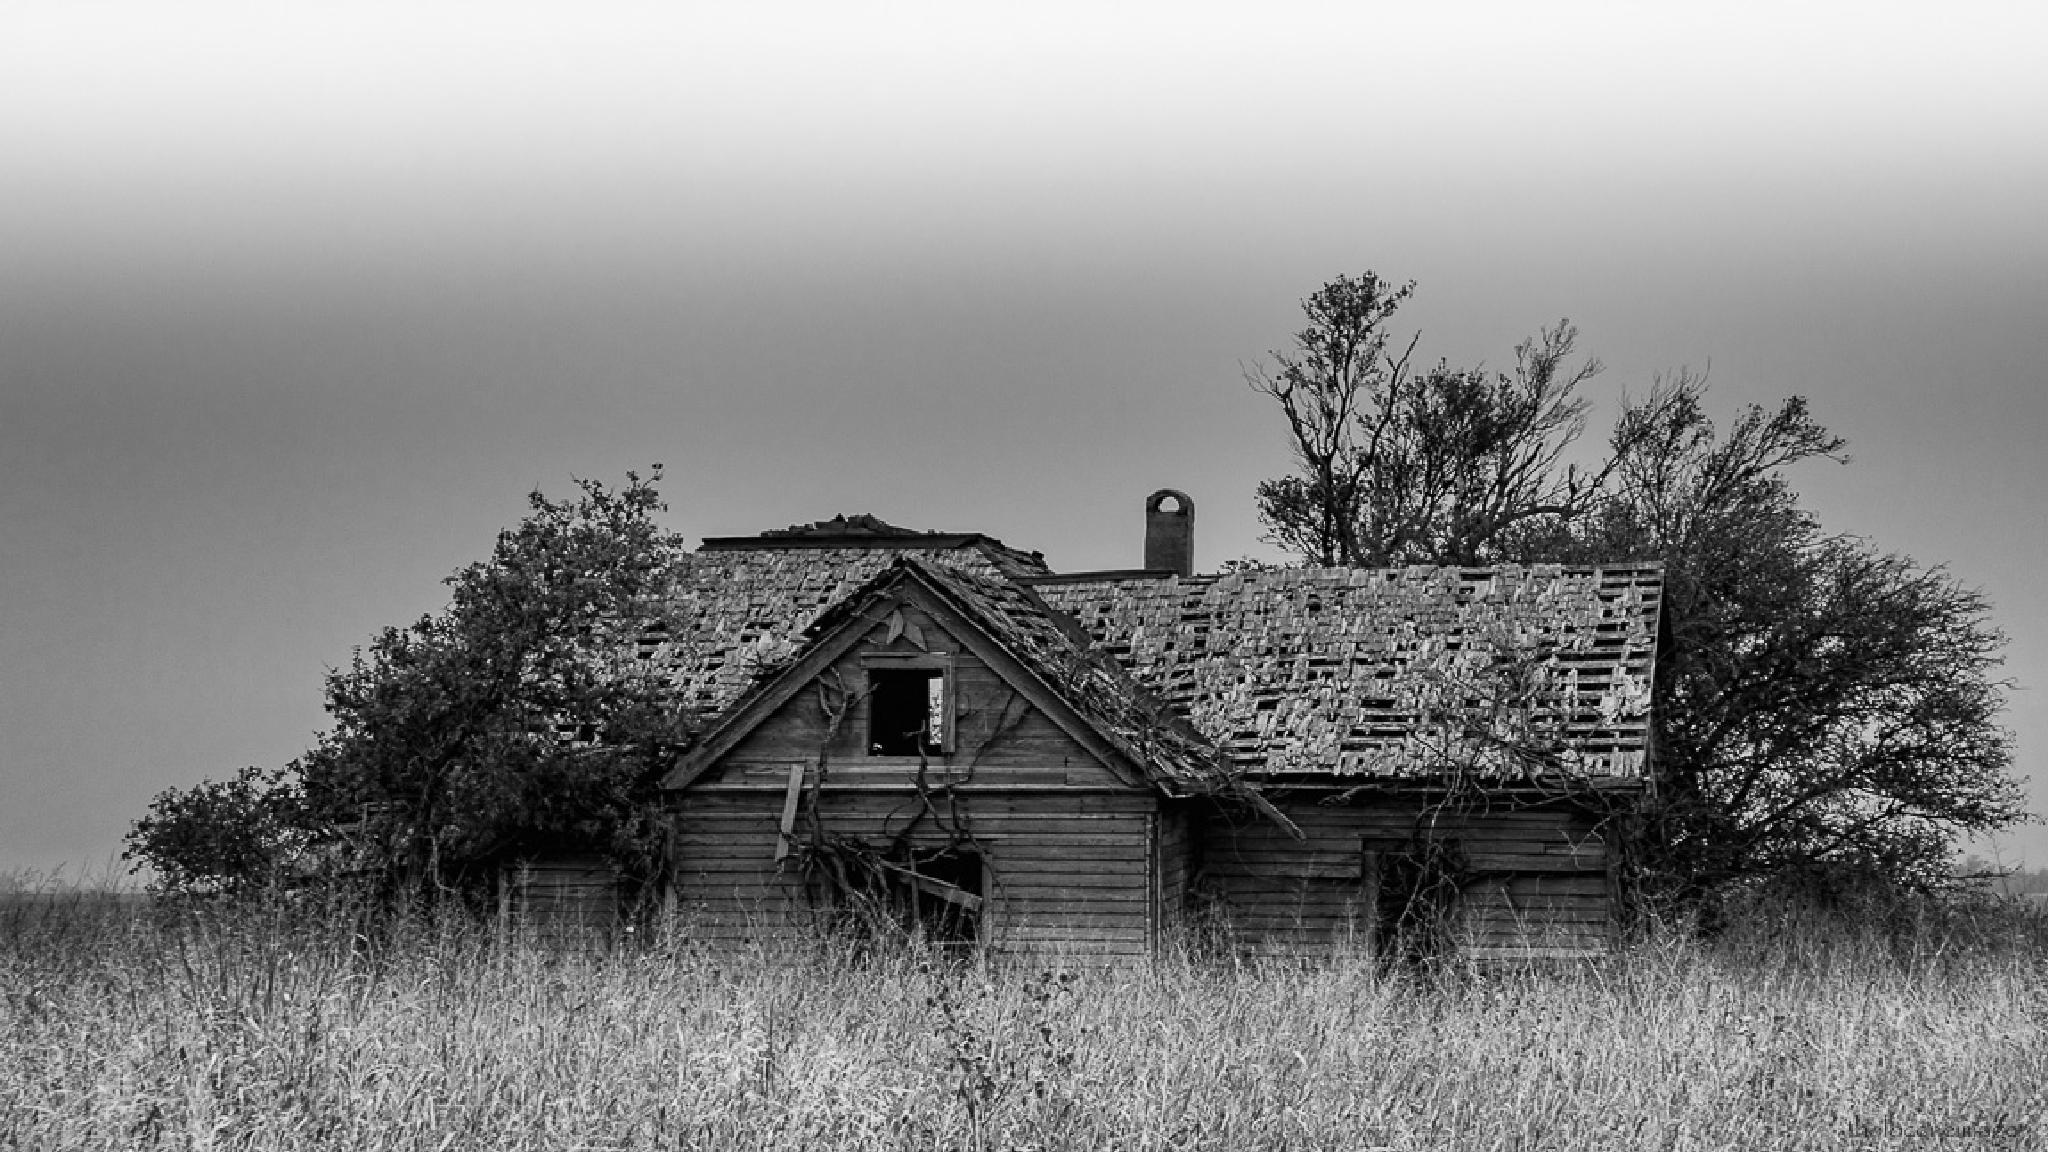 Ghosts by Thomas Welborn